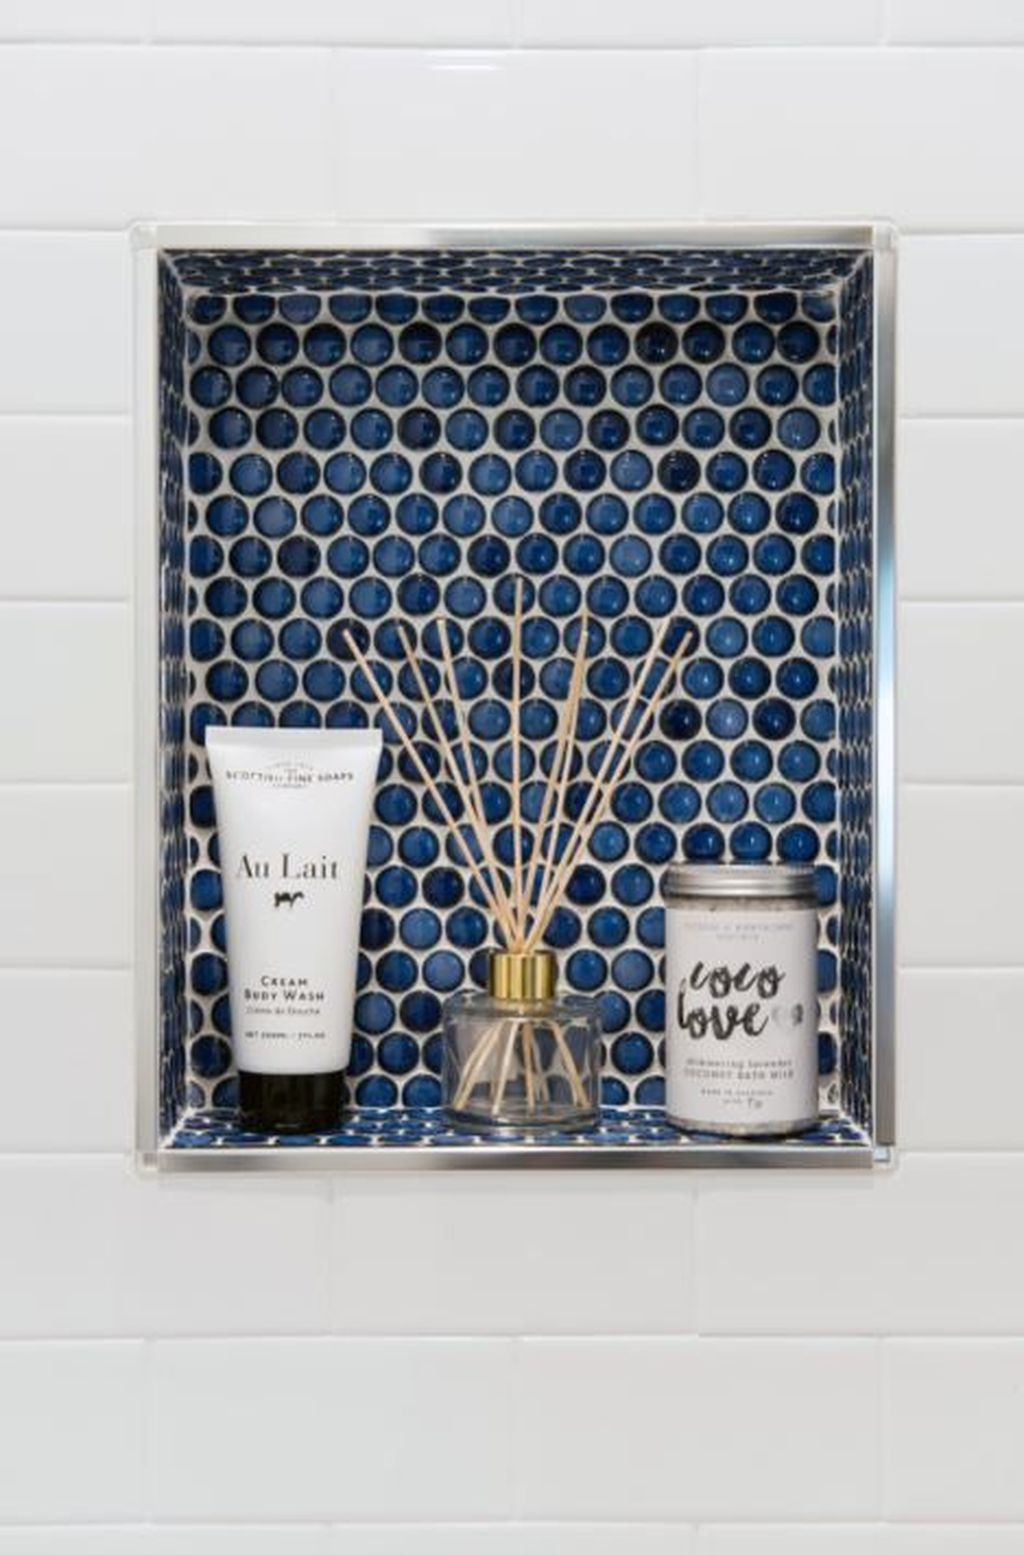 Astonishing Farmhouse Shower Tile Decor Ideas To Try 21